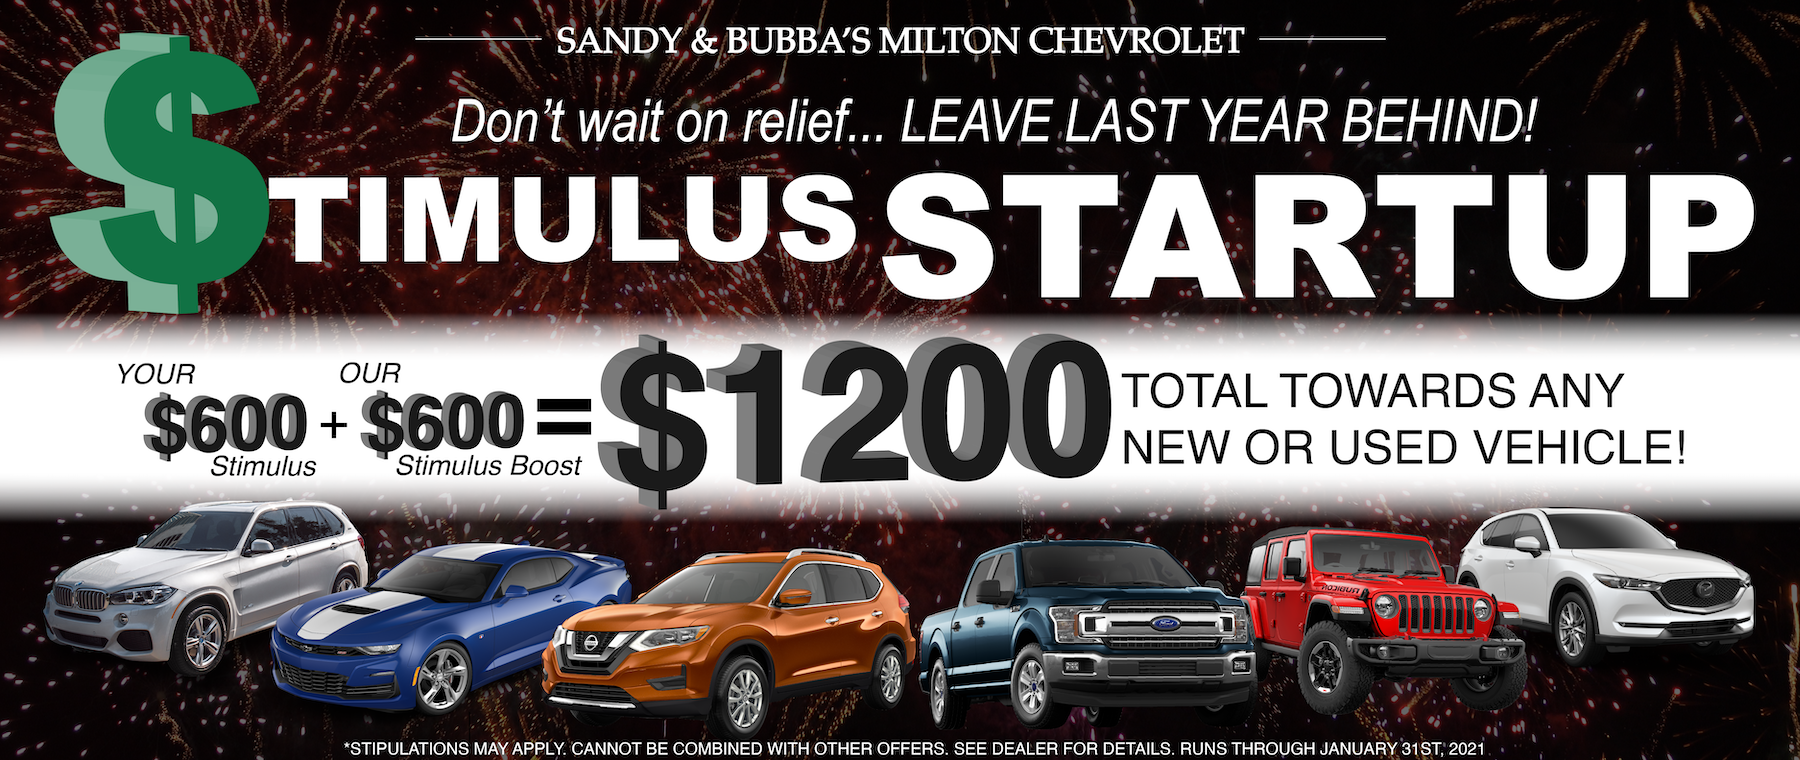 Stimulus savings new cars